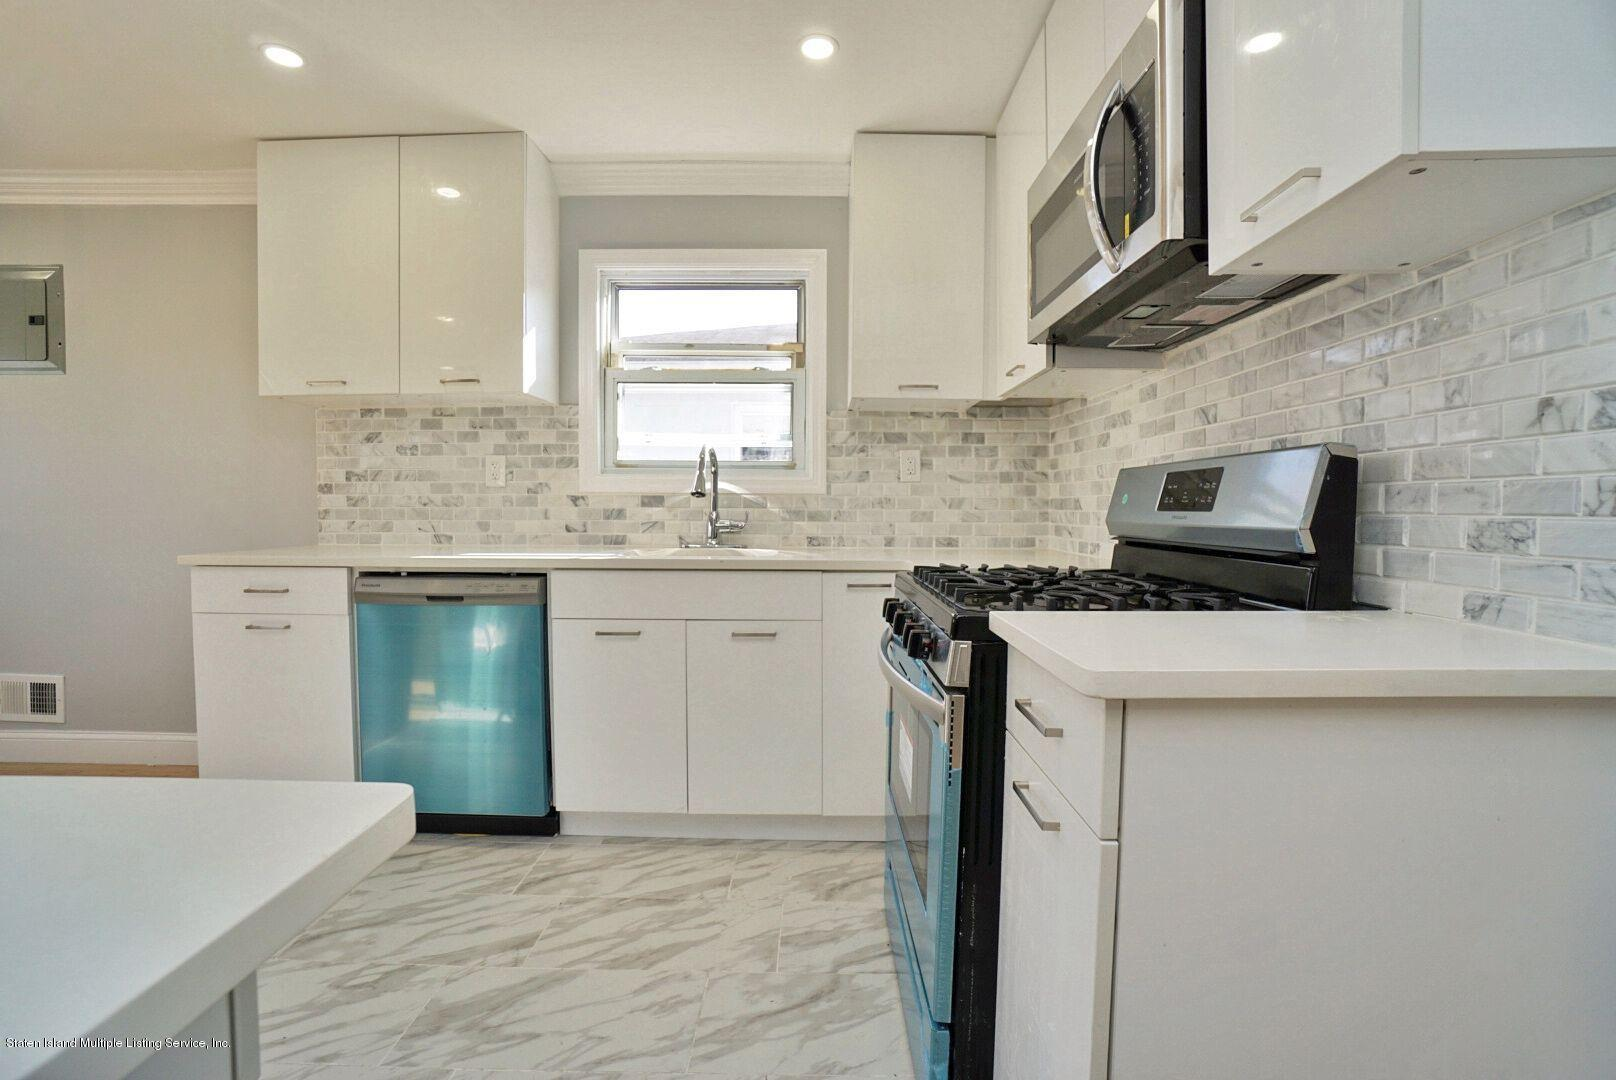 Single Family - Semi-Attached 268 Suffolk Avenue  Staten Island, NY 10314, MLS-1131293-32